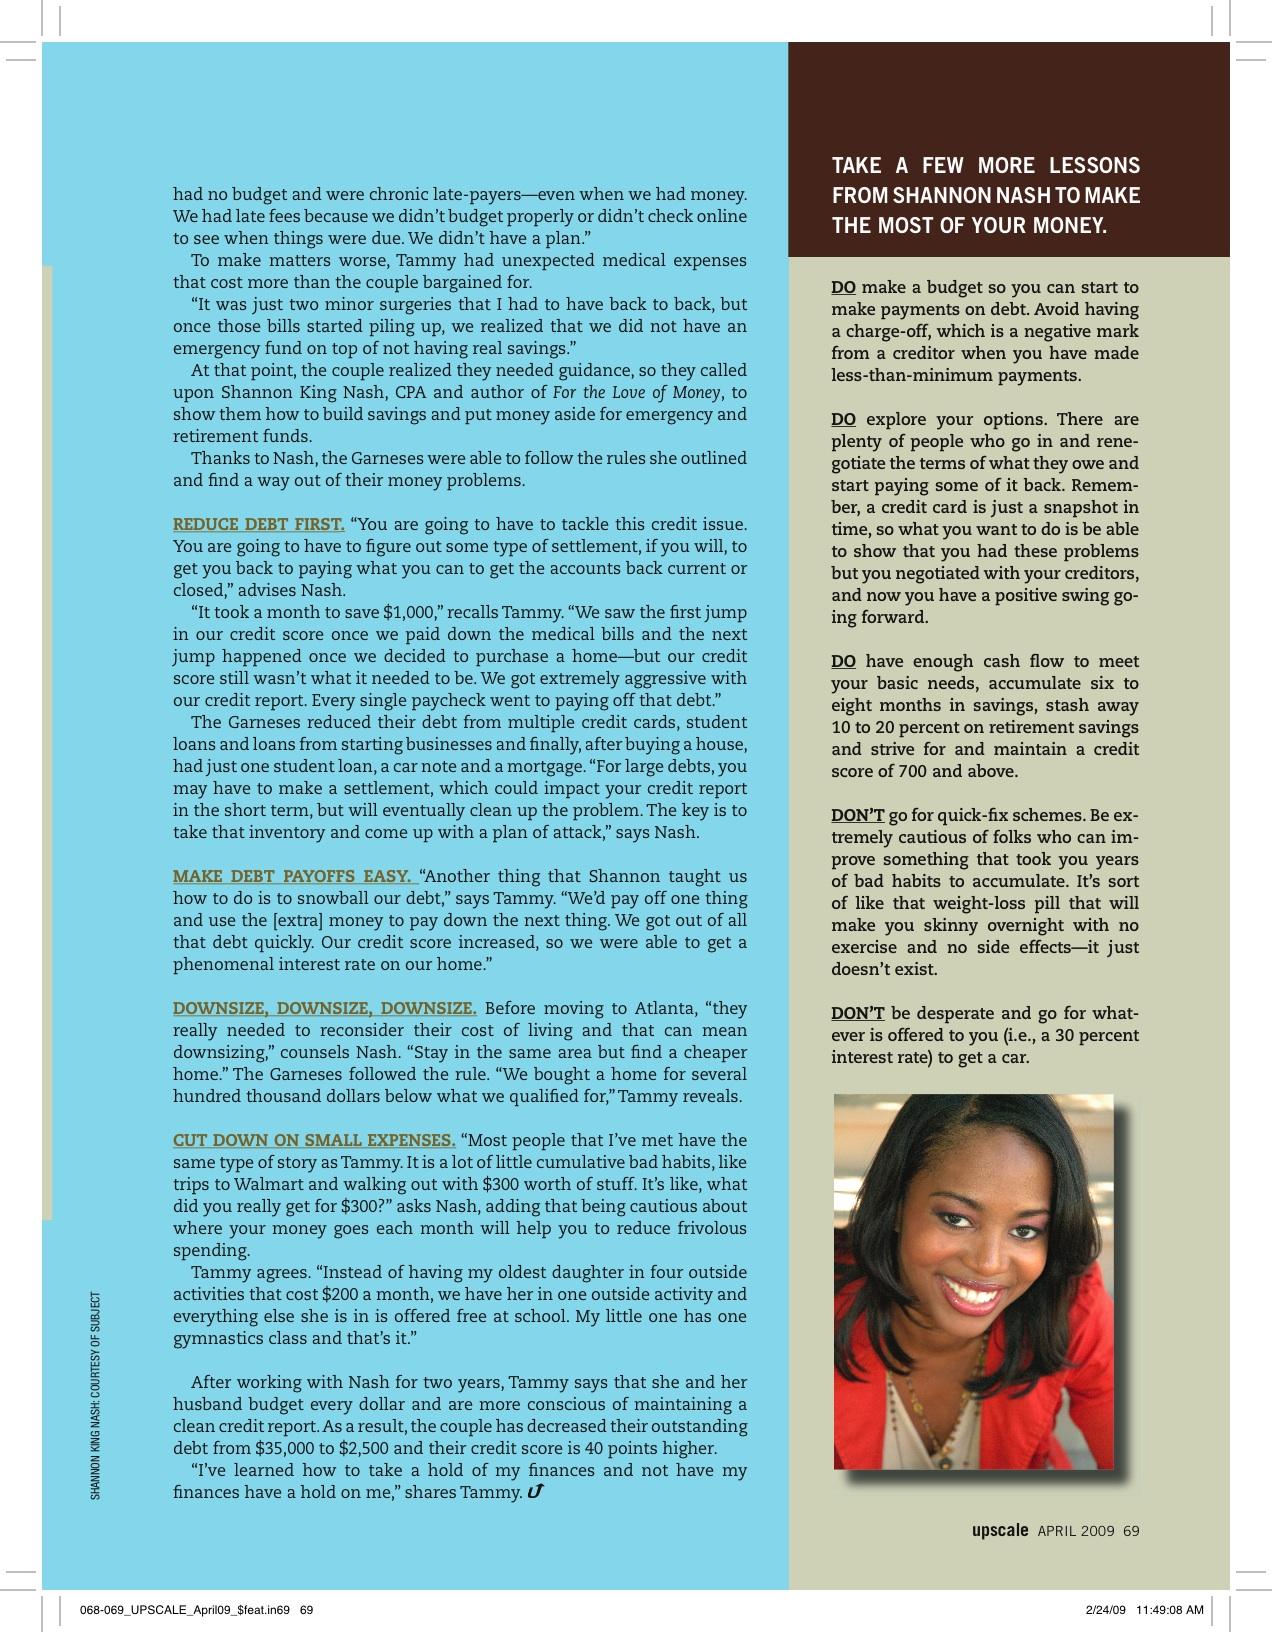 Upscale Magazine April 2009 (2)